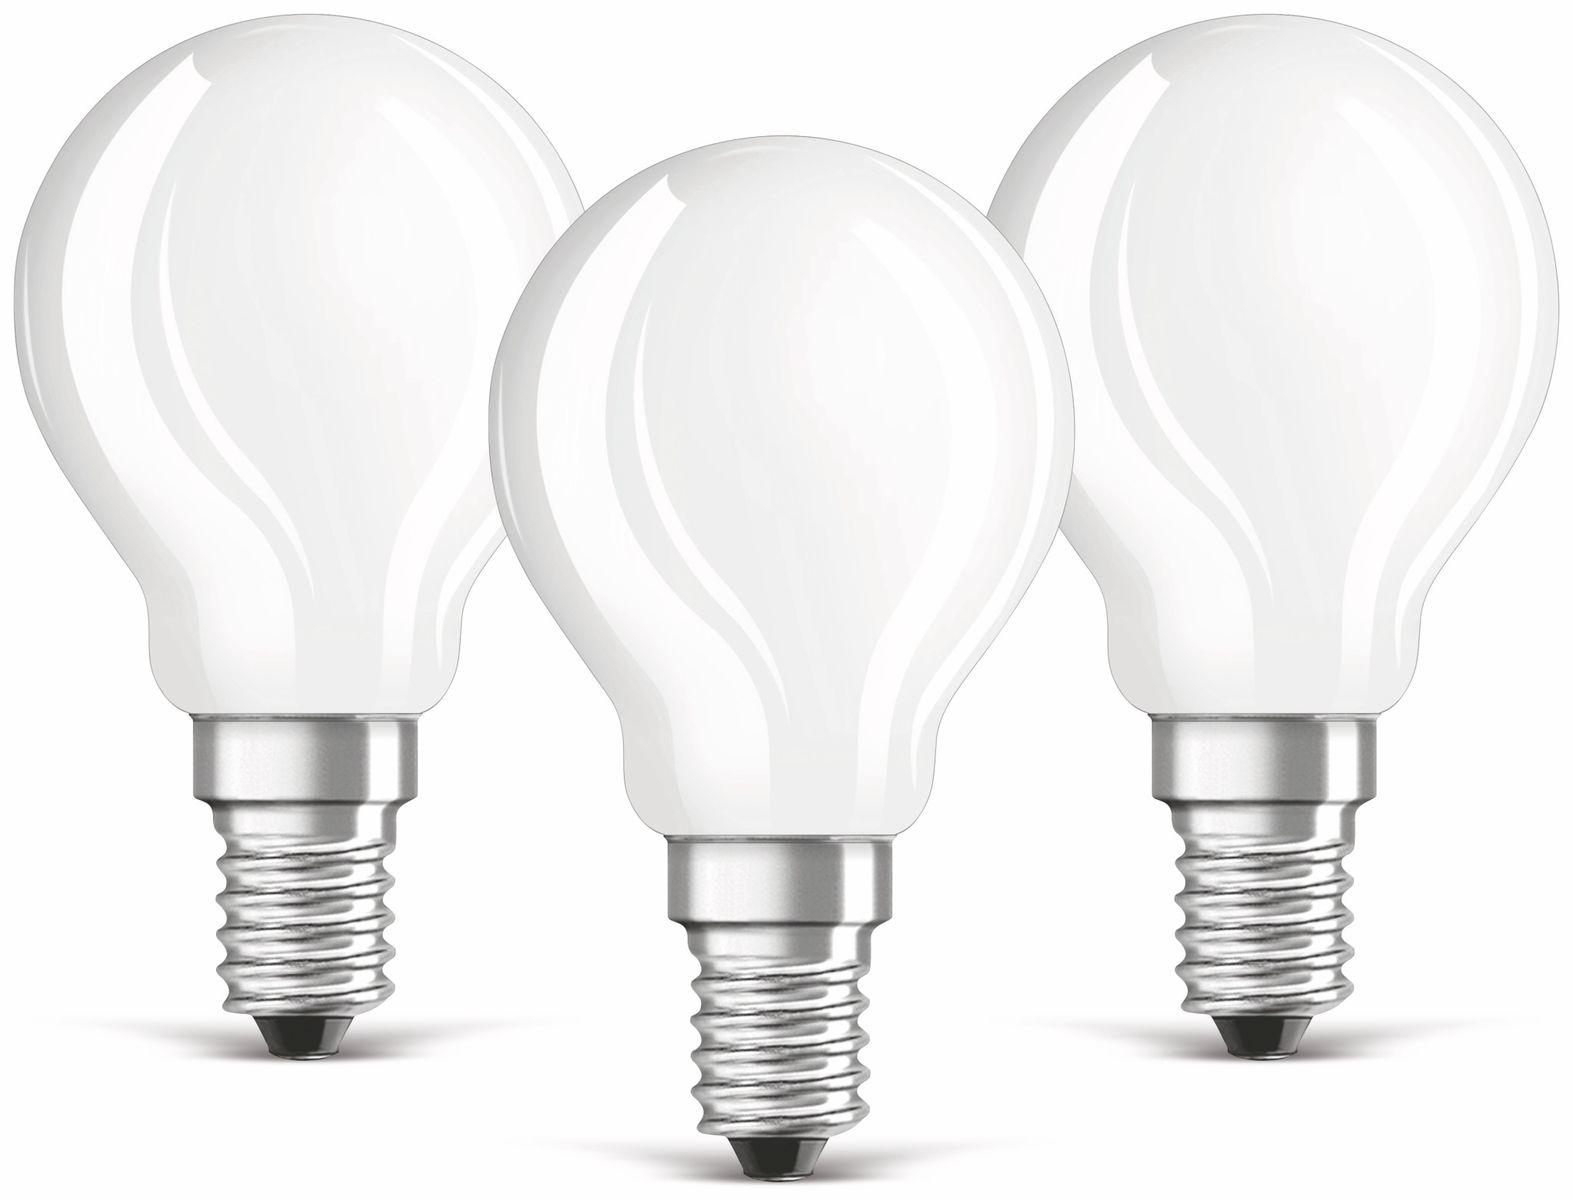 Led lampe osram base p e14 eek: a 4w 470 lm 2700 k 3 stück